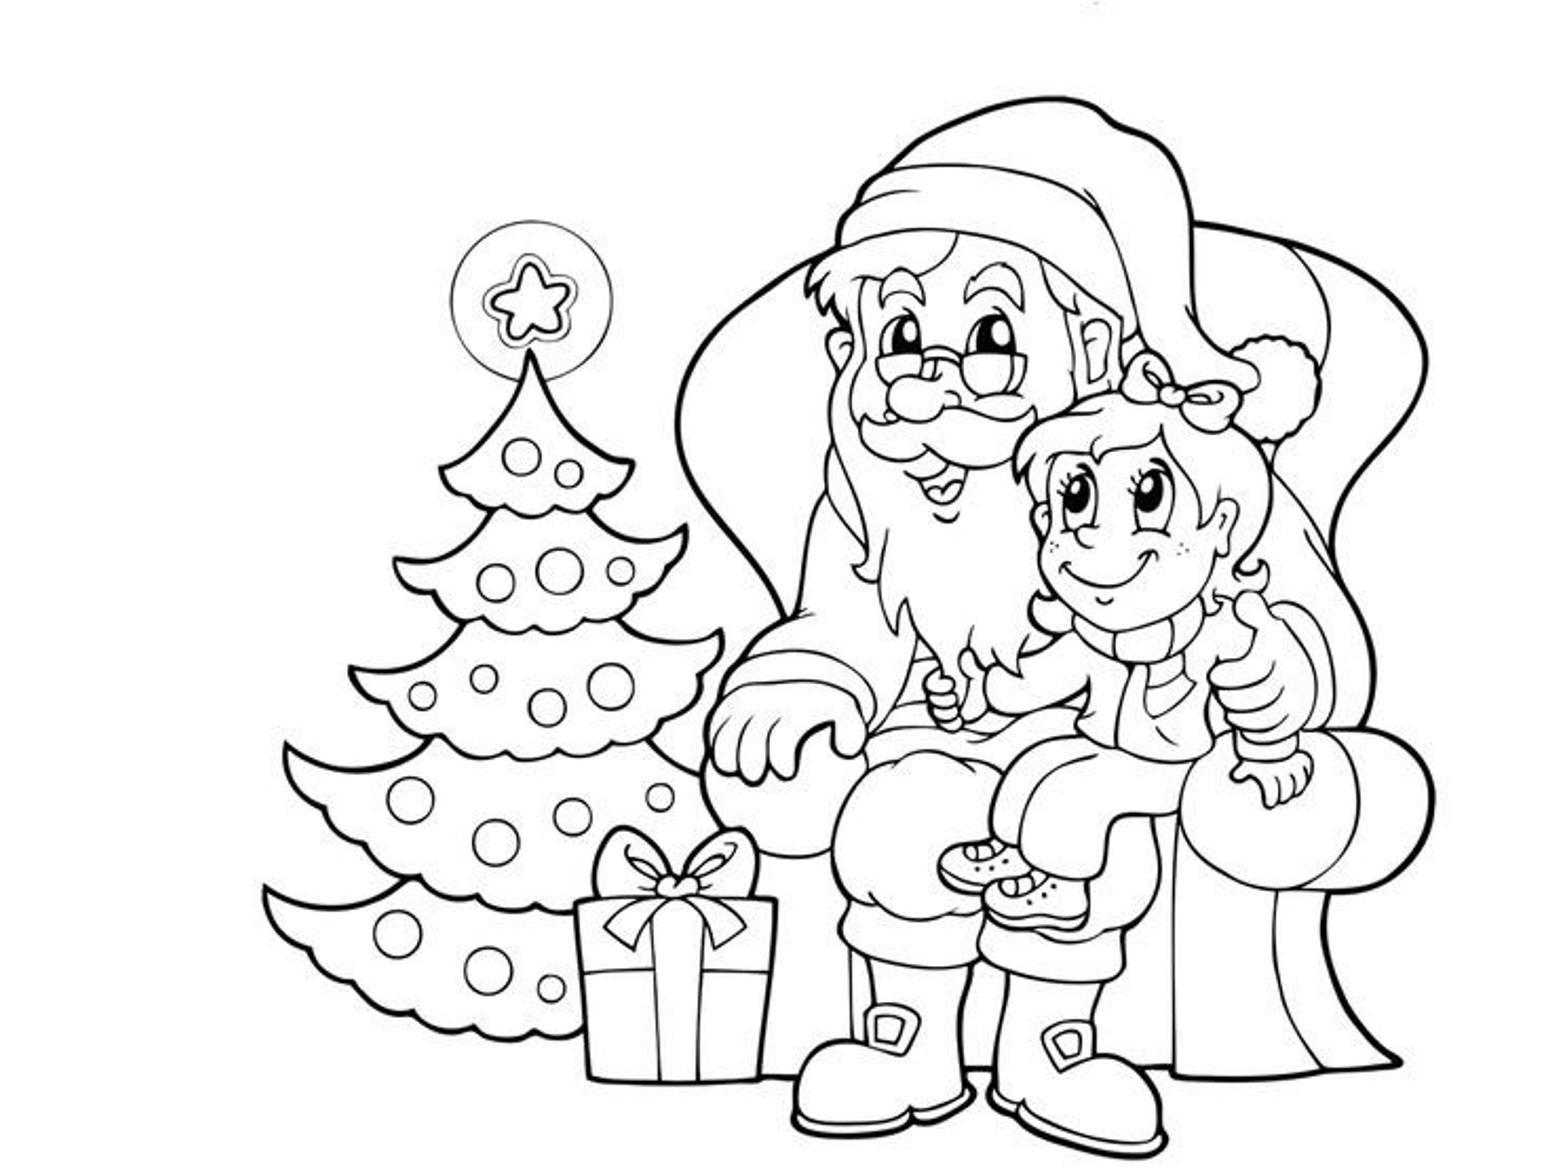 Santa Claus Drawing For Kids At Getdrawings